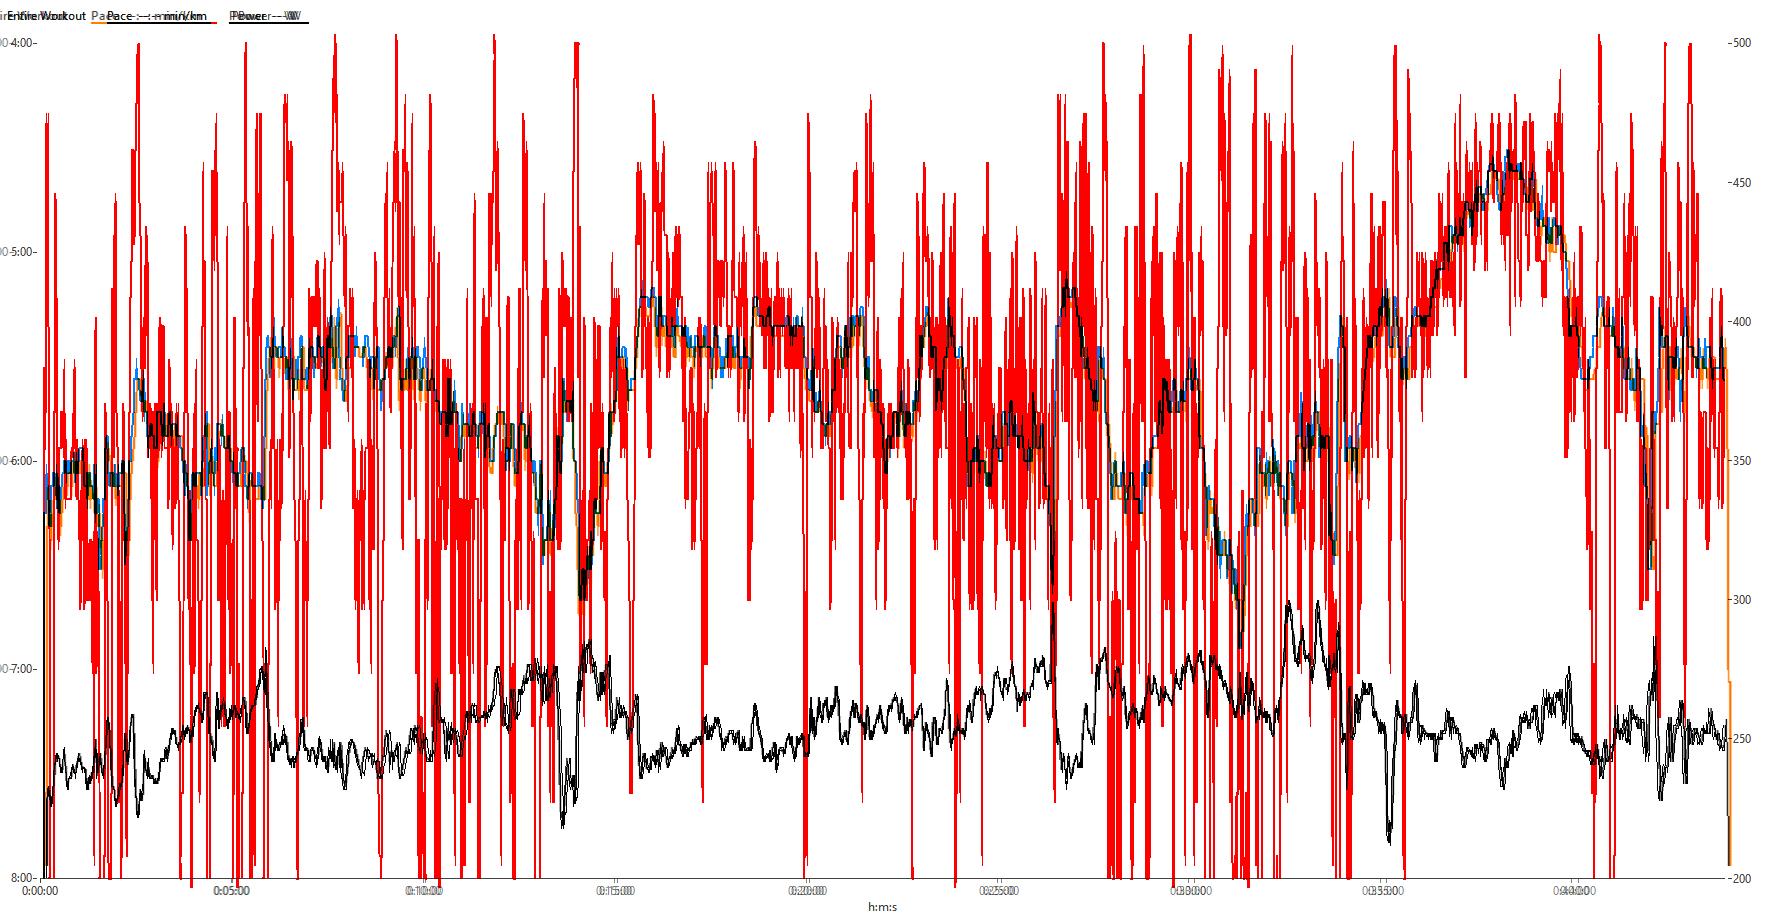 Garmin (blau), Stryd (orange) und Polar Vantage V (Stryd)